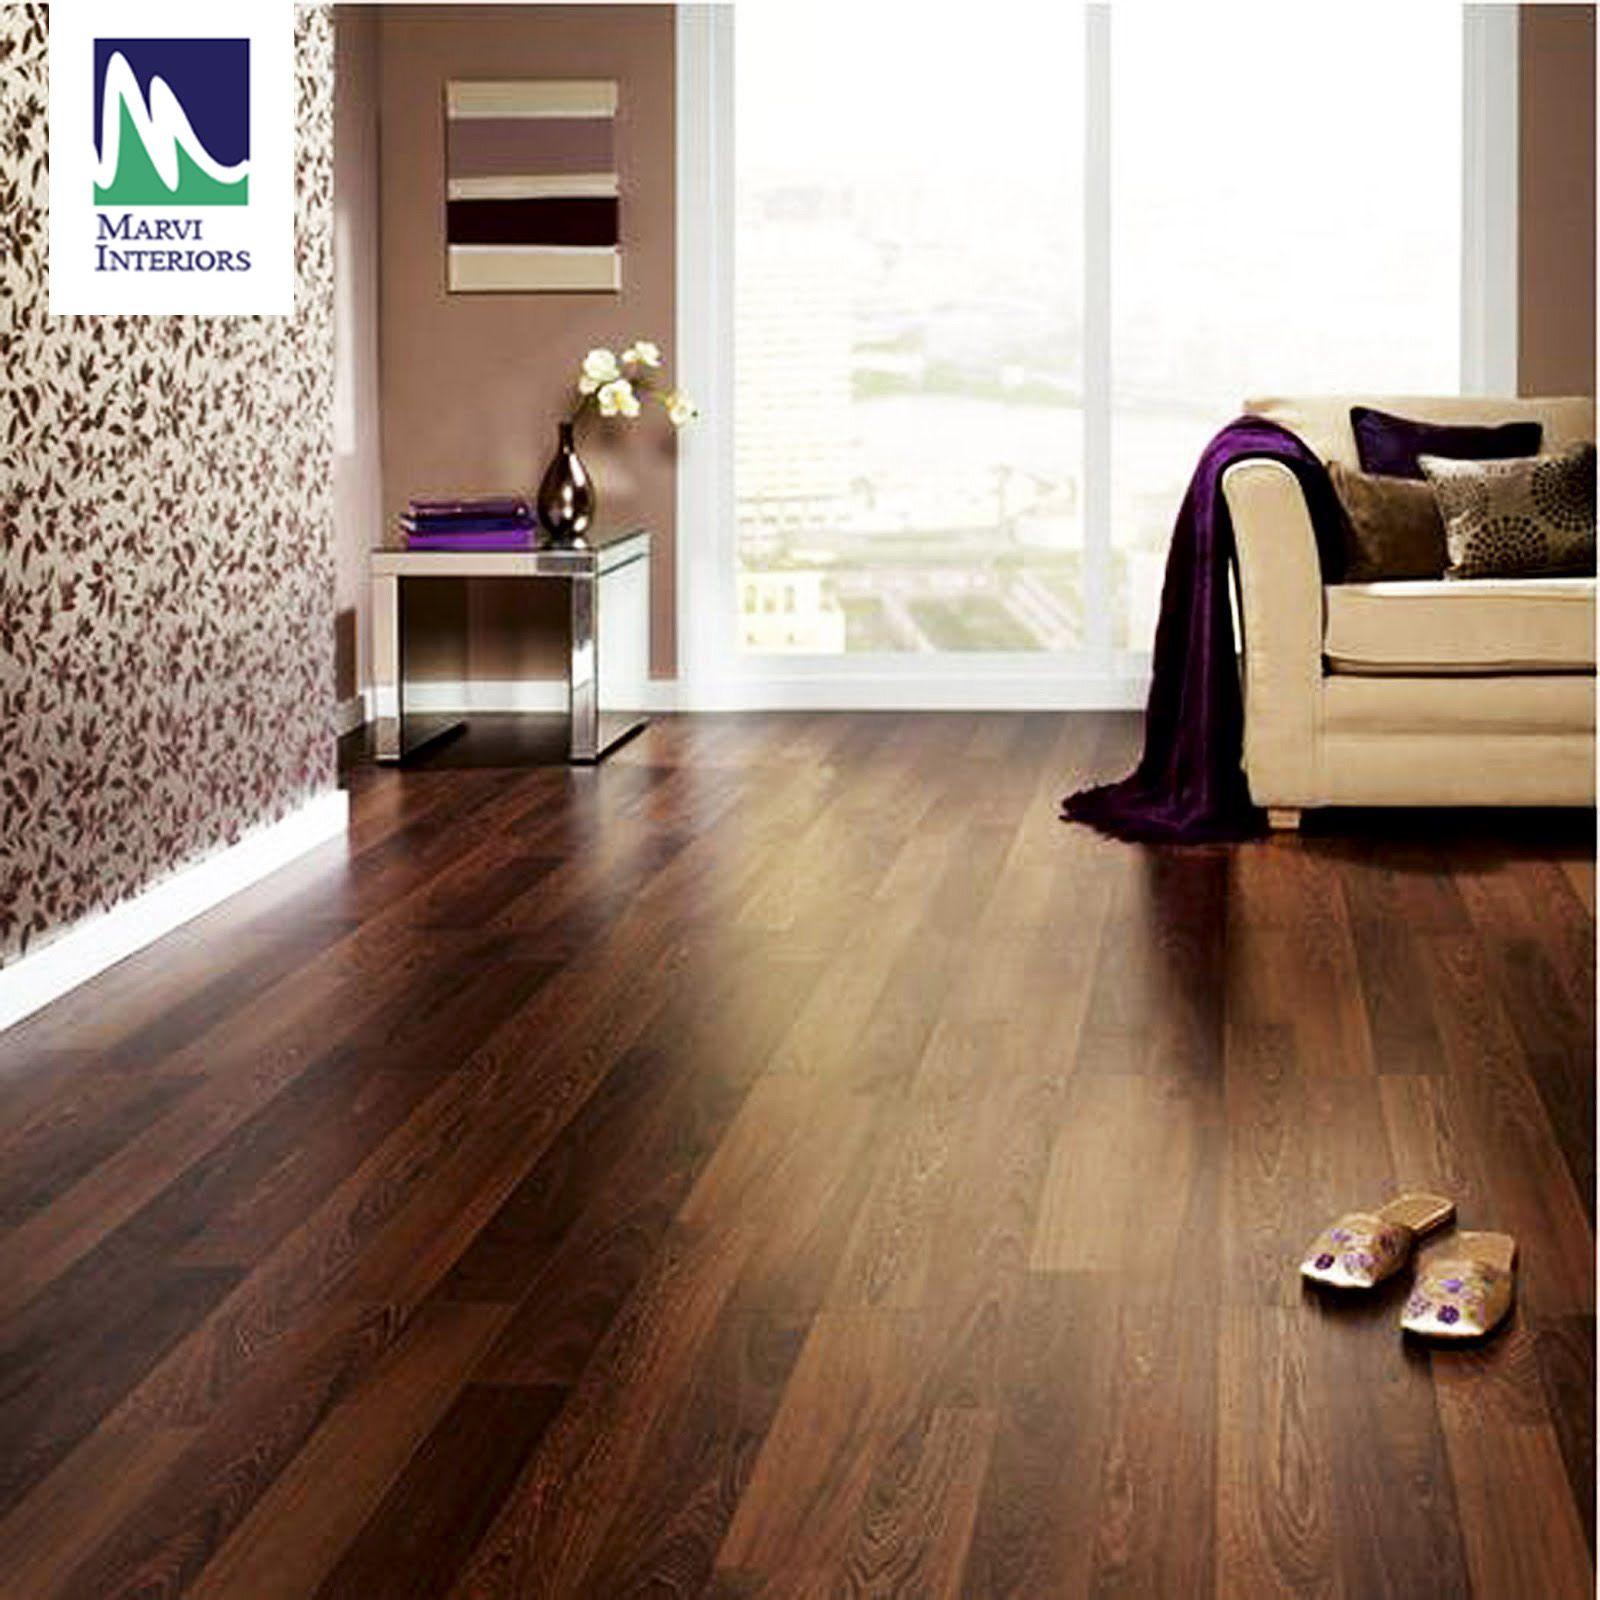 Interior Designing Home Decorations Service At Marviinteriors Com Flooring Hdf Floor Traditional Design Living Room